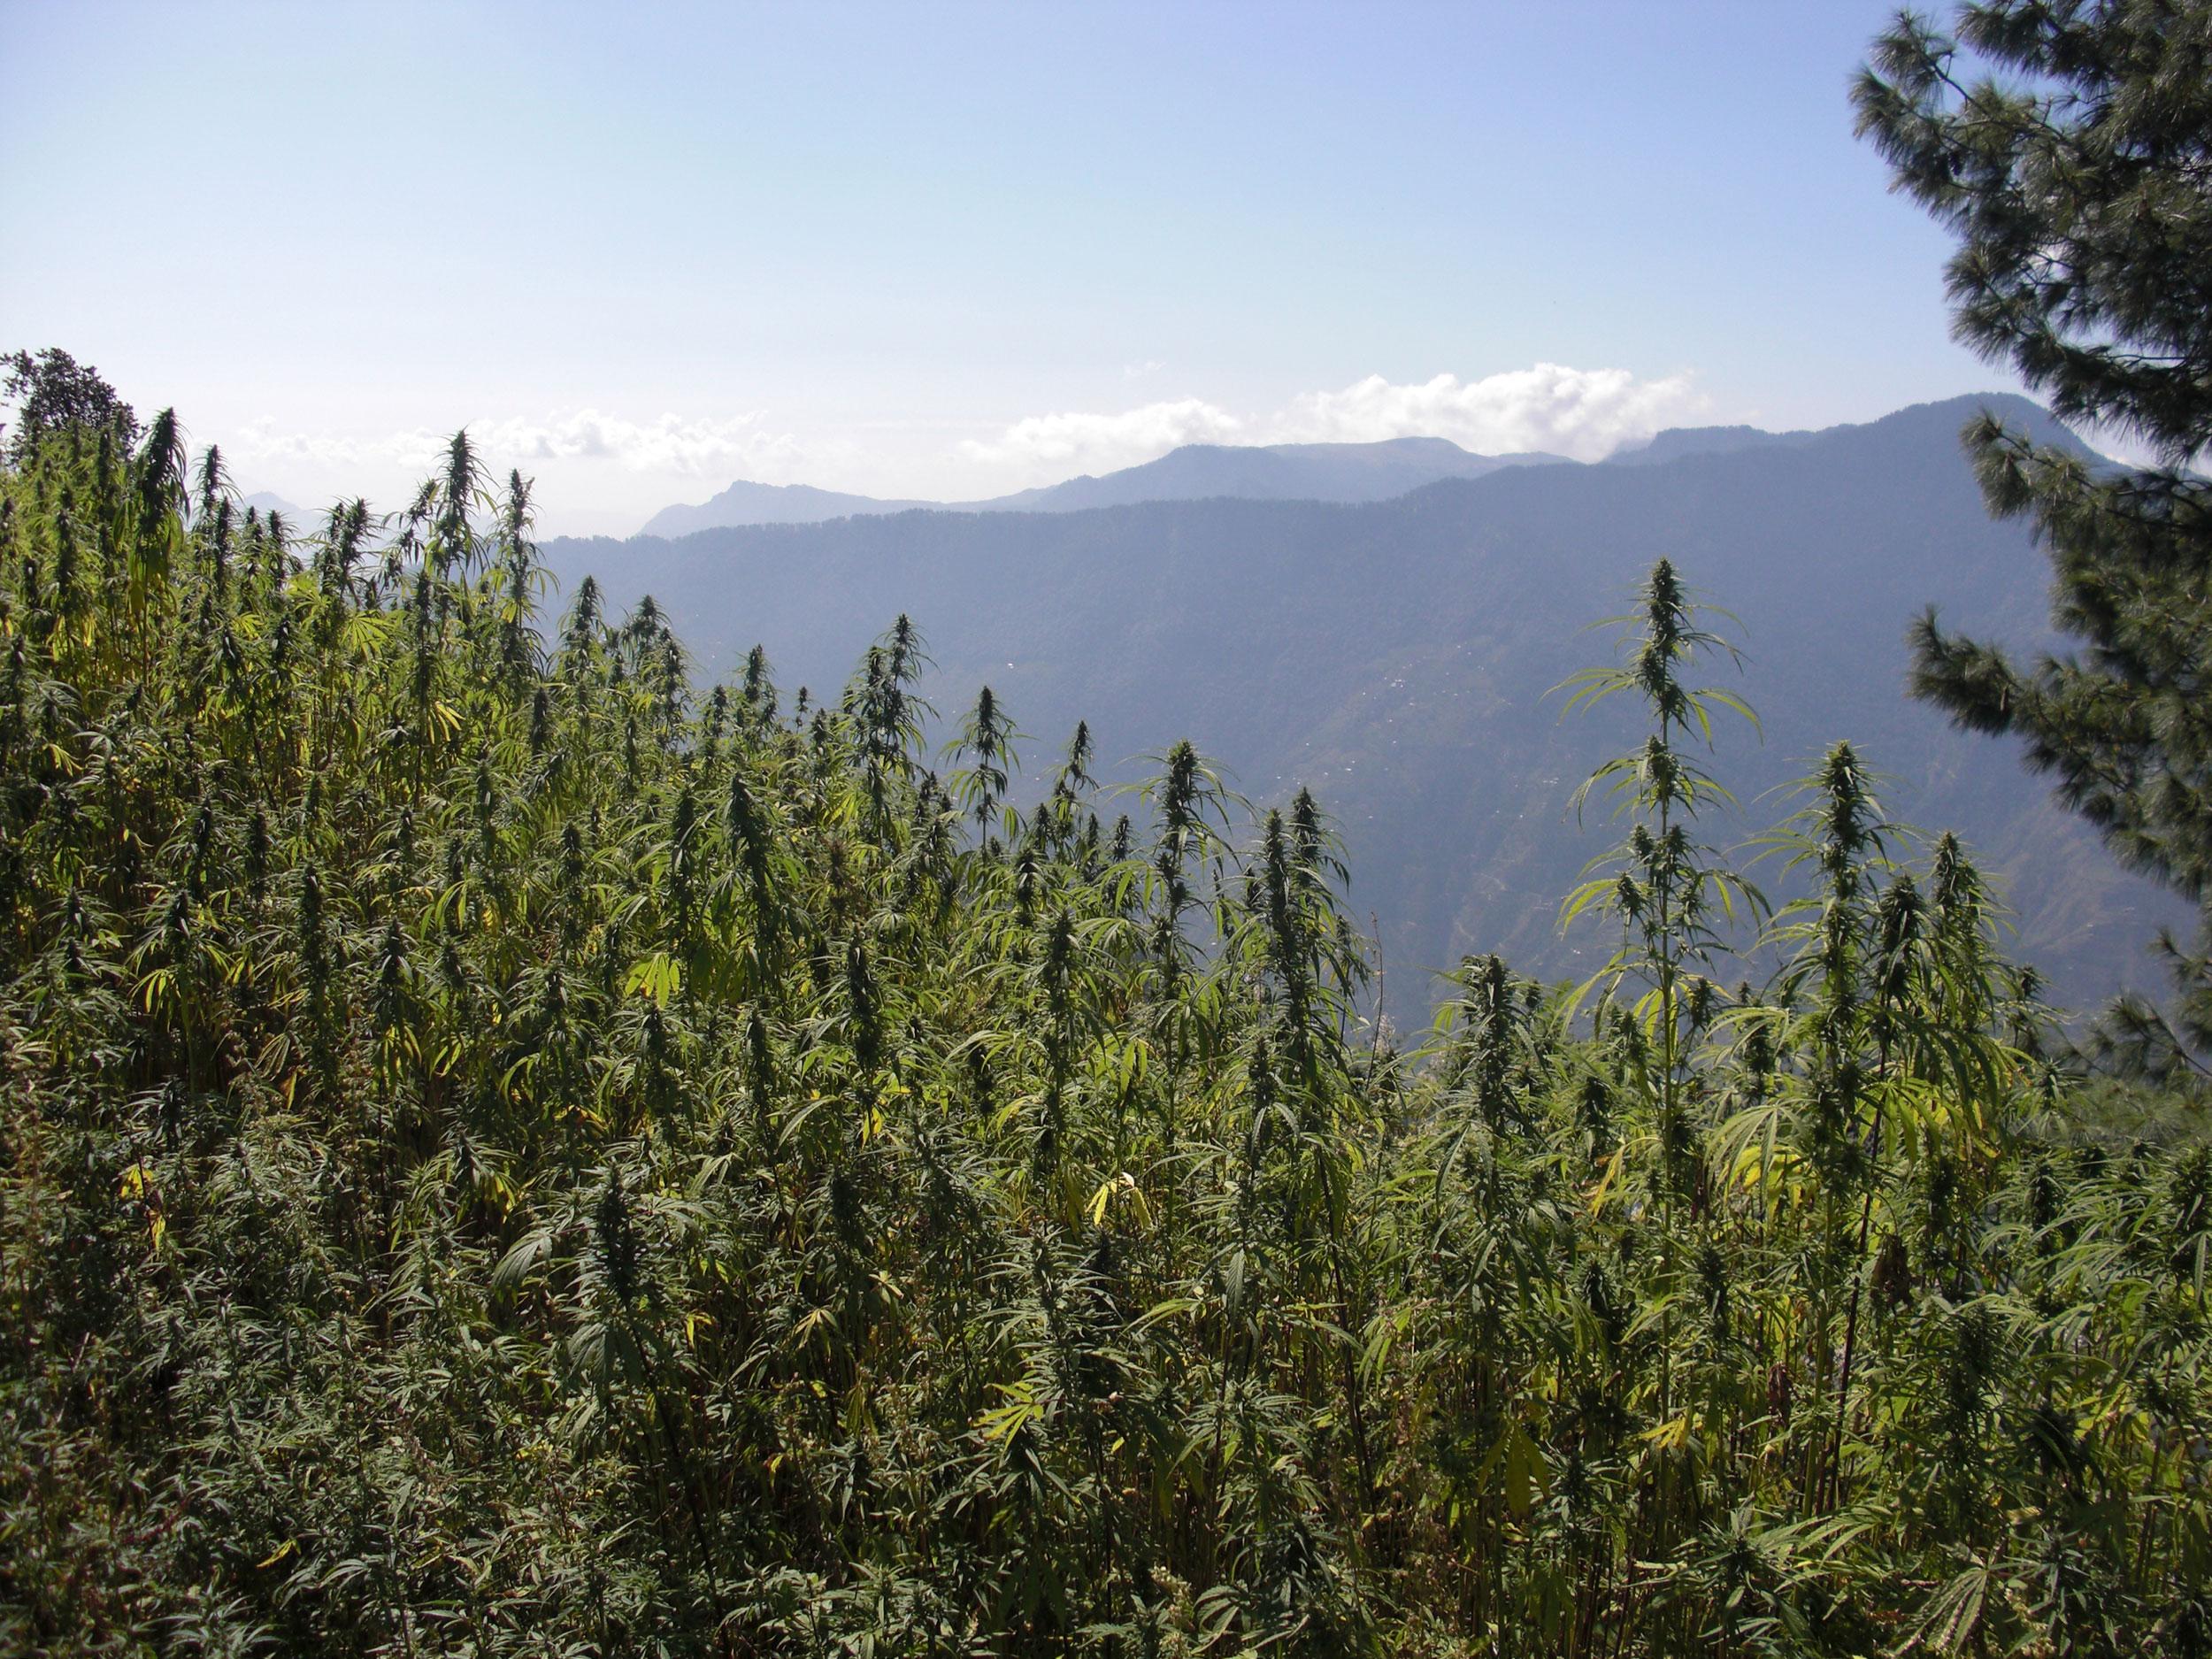 Reisebericht: Indiens legendäres Kifferparadies